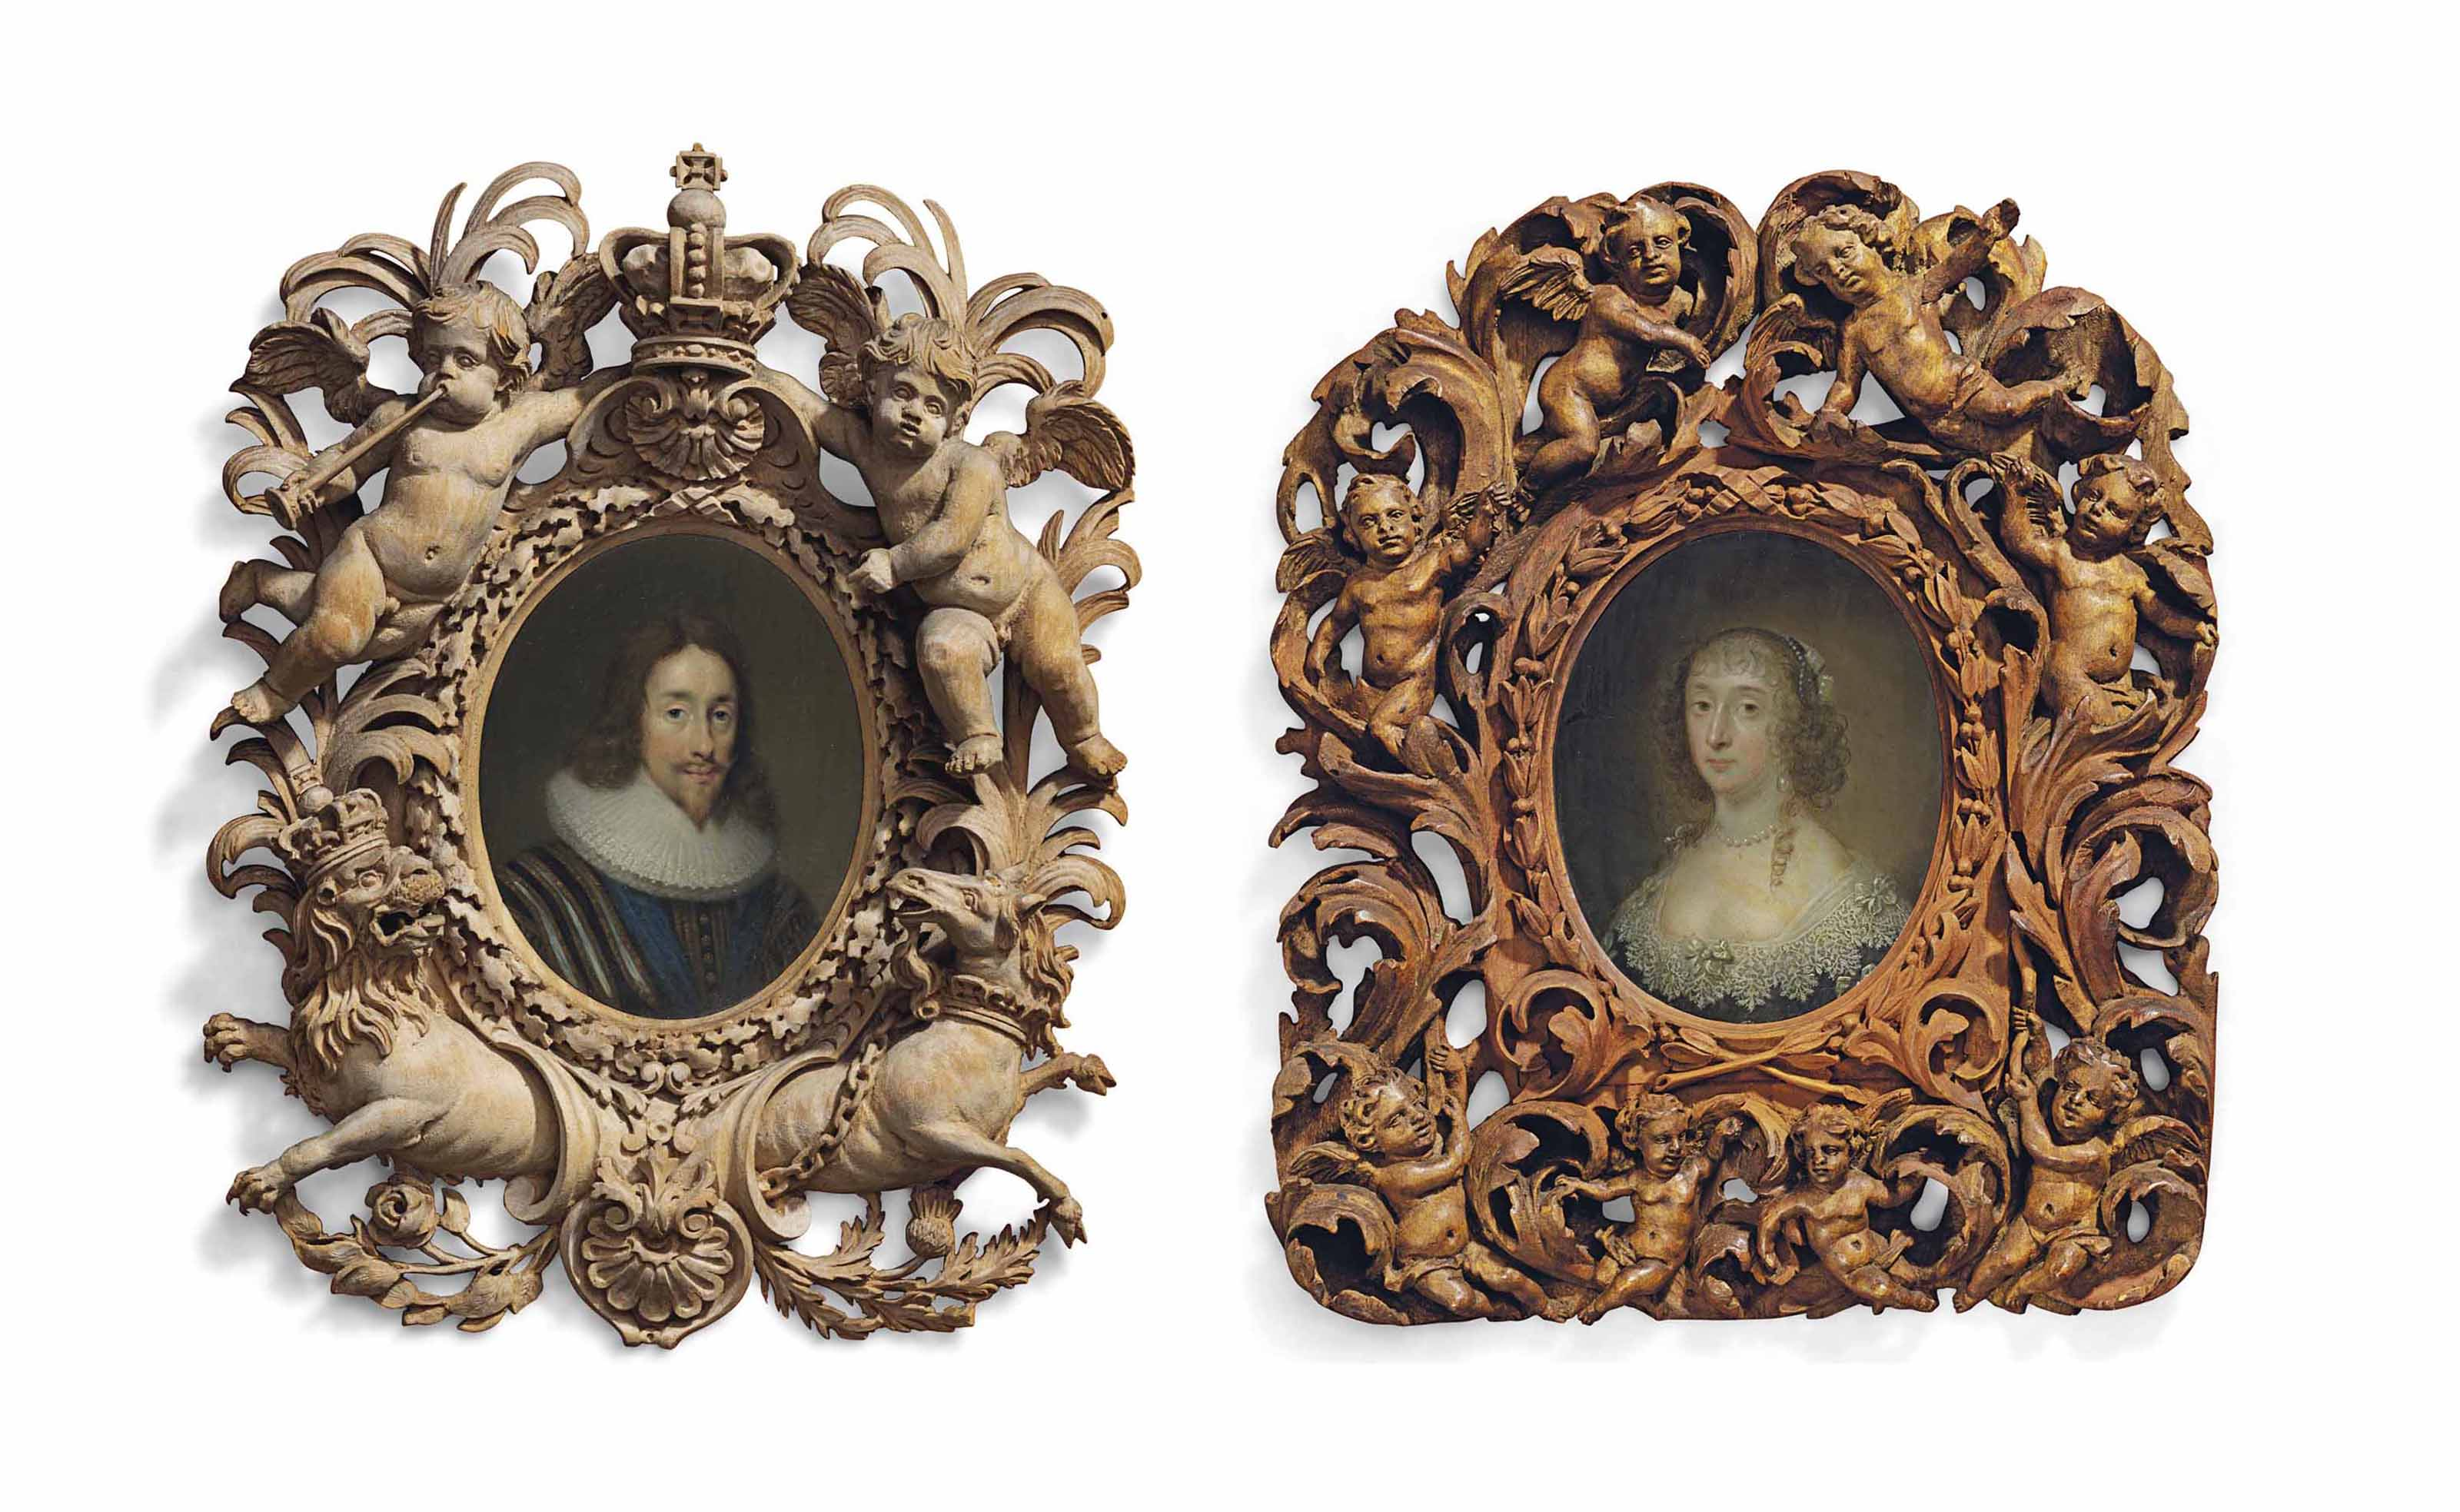 CORNELIS JONSON VAN CEULEN (ANGLO-DUTCH, 1593 - 1661/1662)